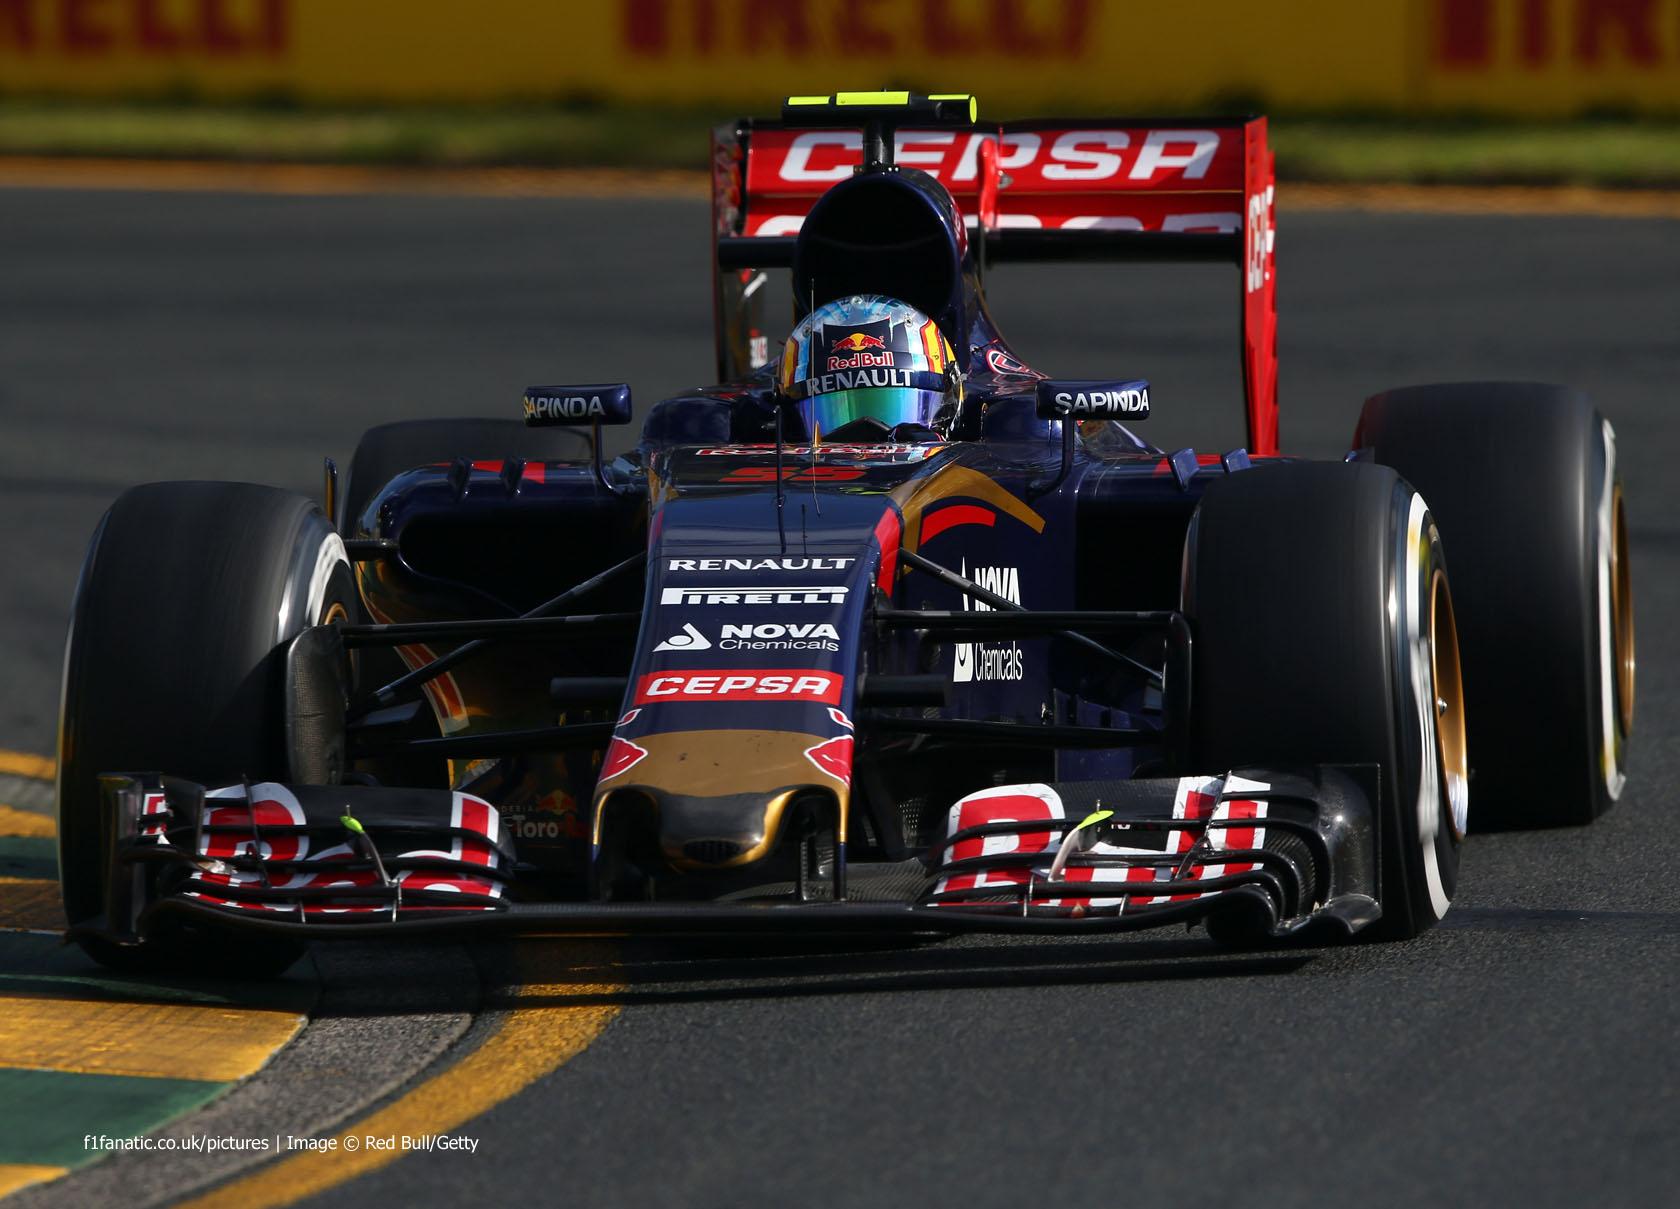 Equipes de Formula 1  - Toro Rosso - f1fanatic.co.uk